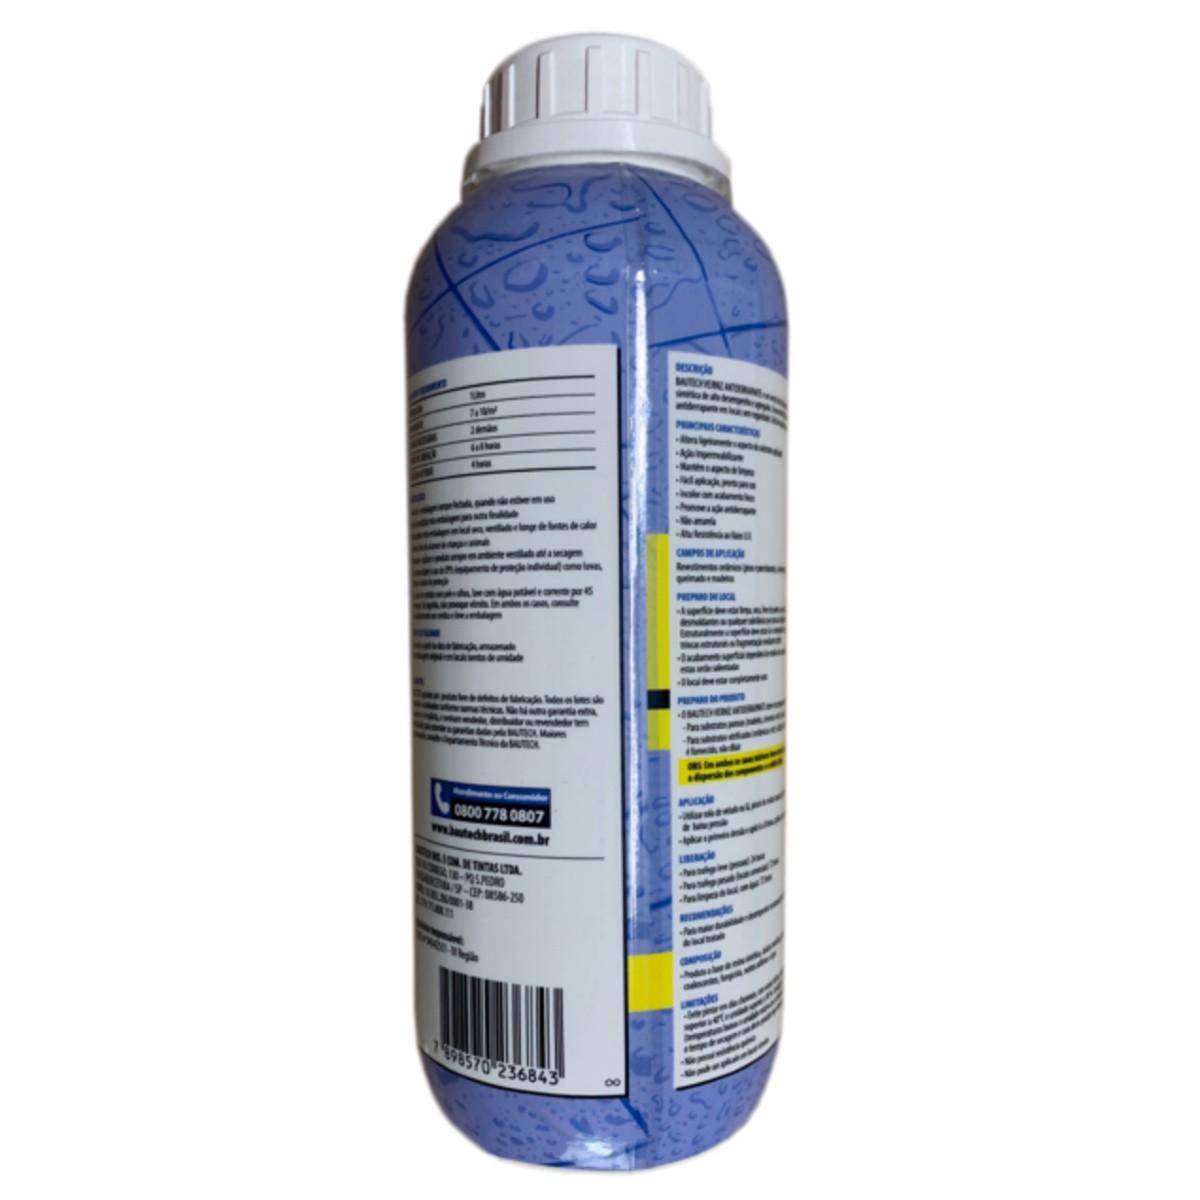 Verniz Antiderrapante Bautech 1L